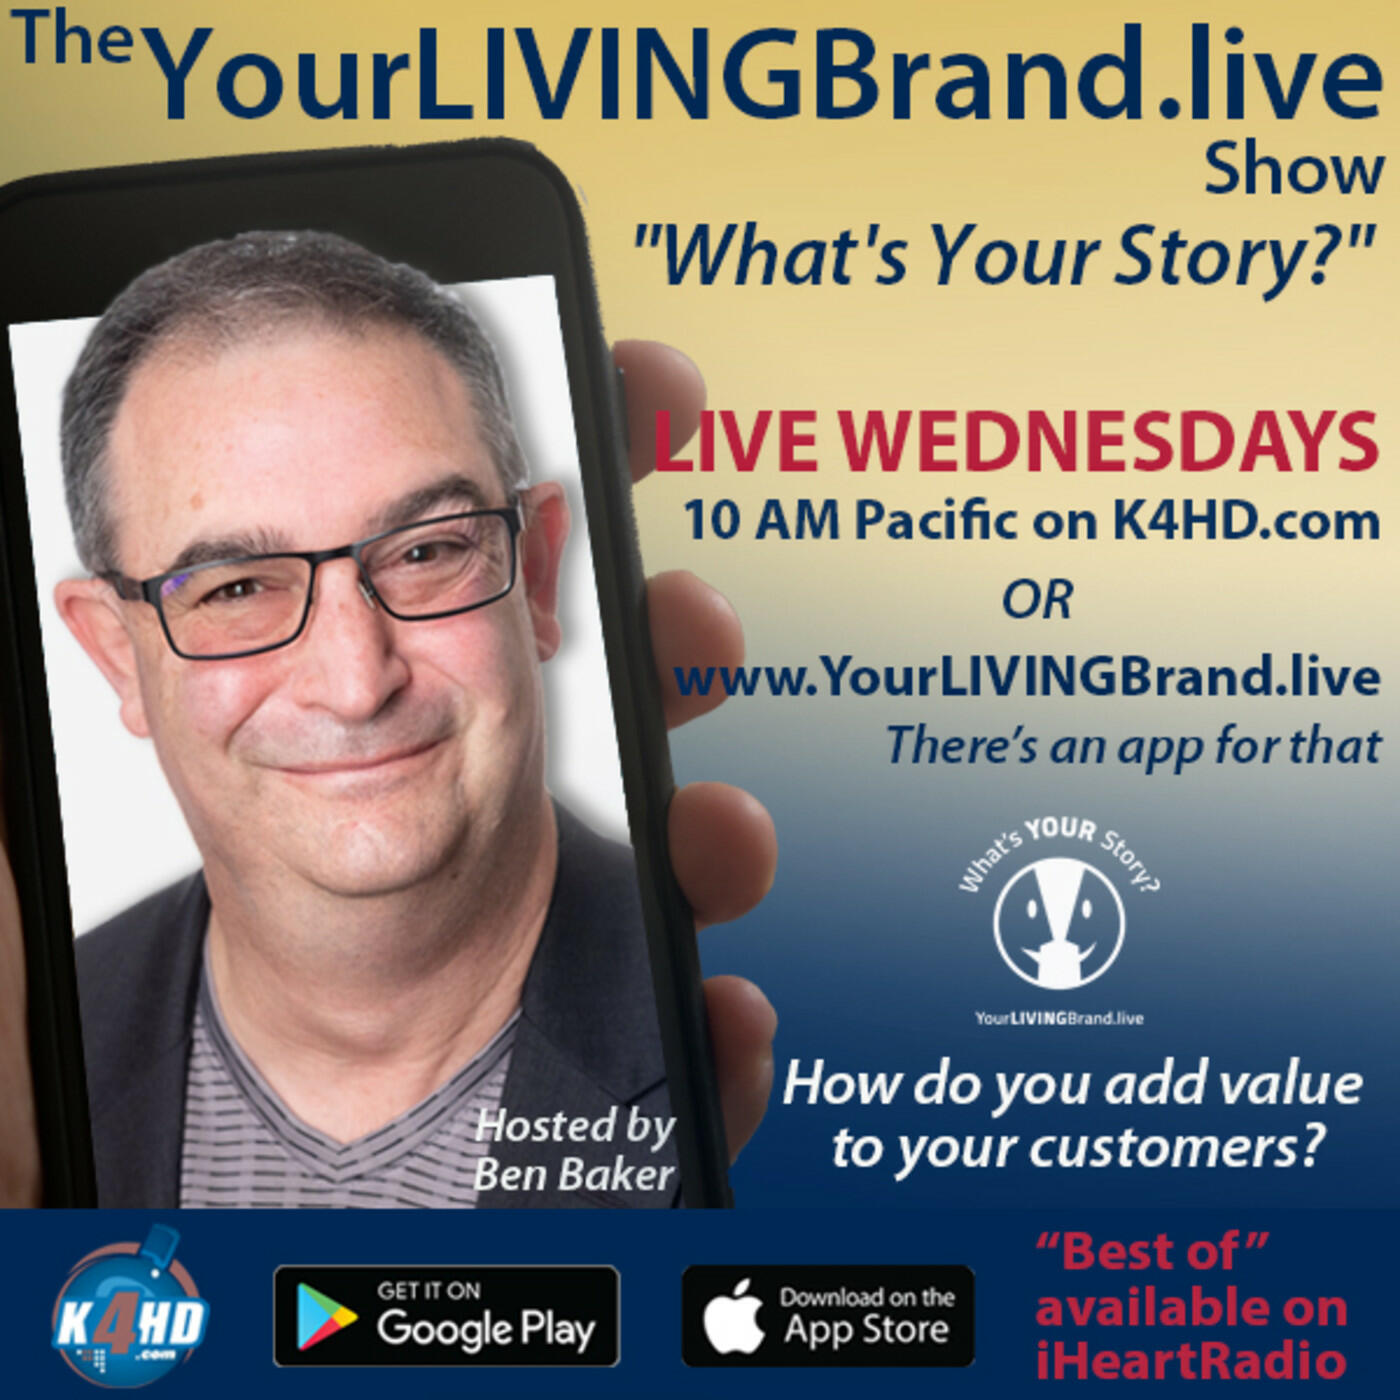 The YourLIVINGBrand.live Show